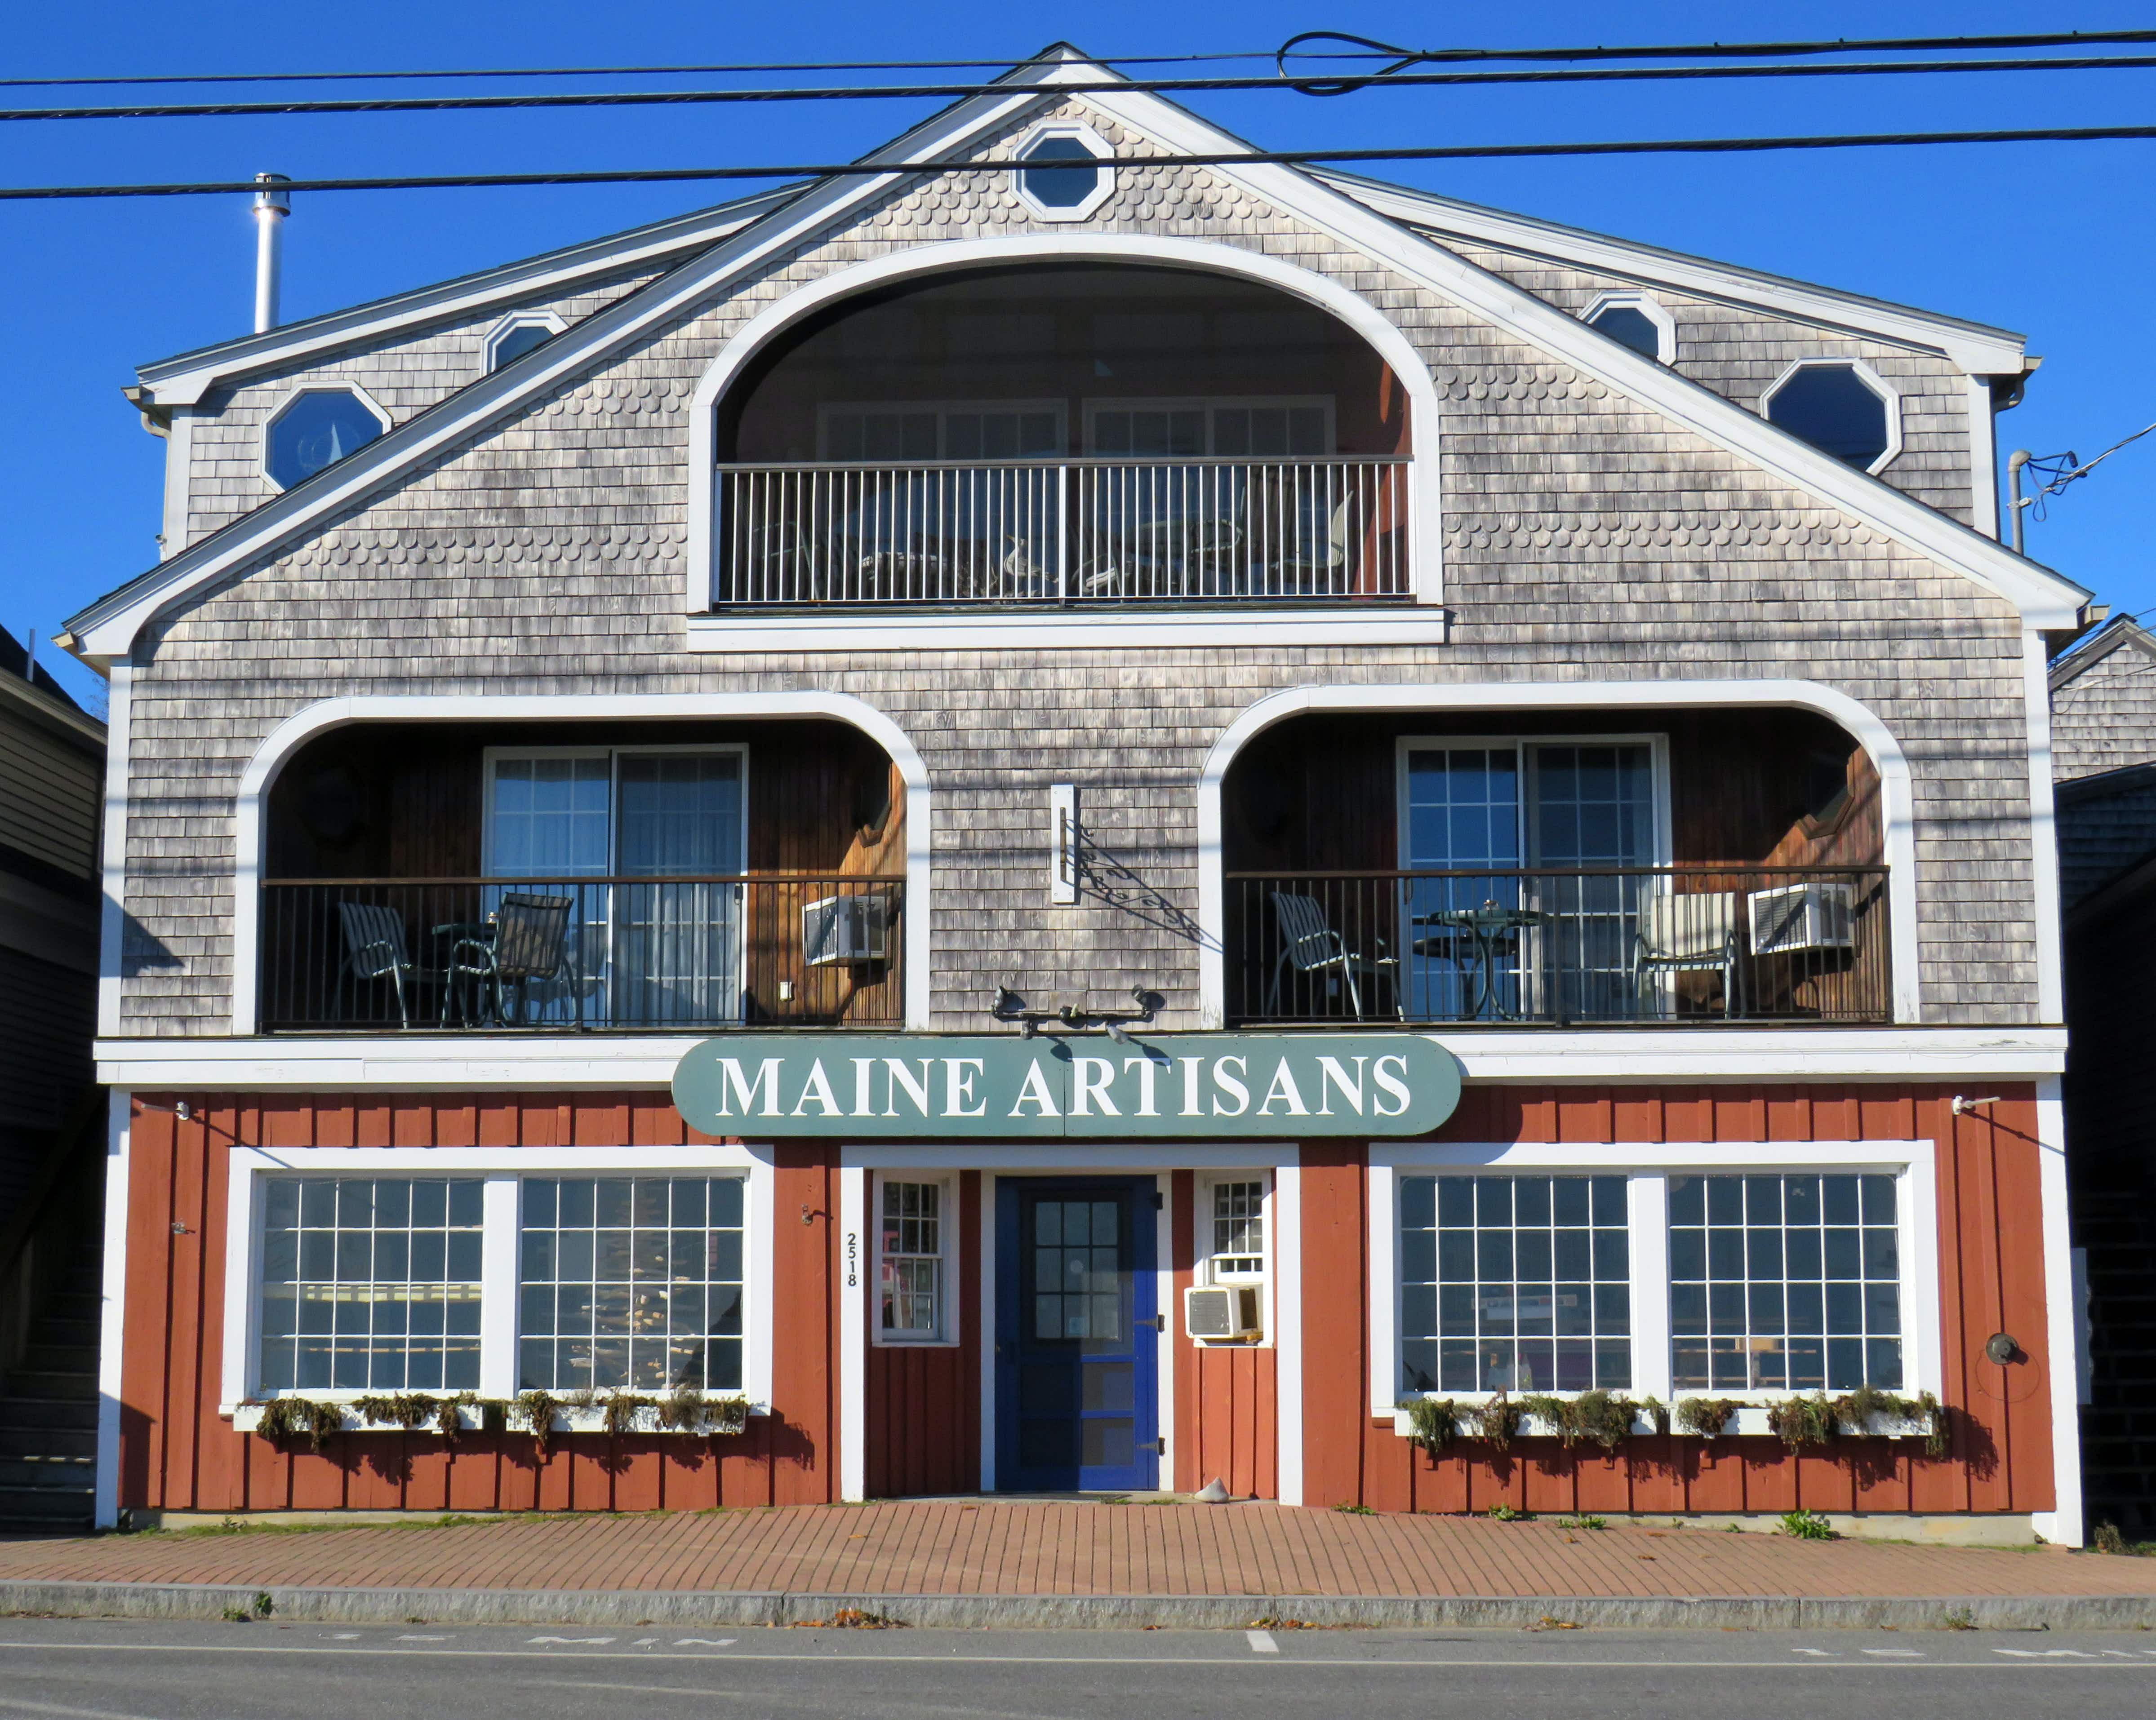 Art and artisanal craft of Midcoast Maine